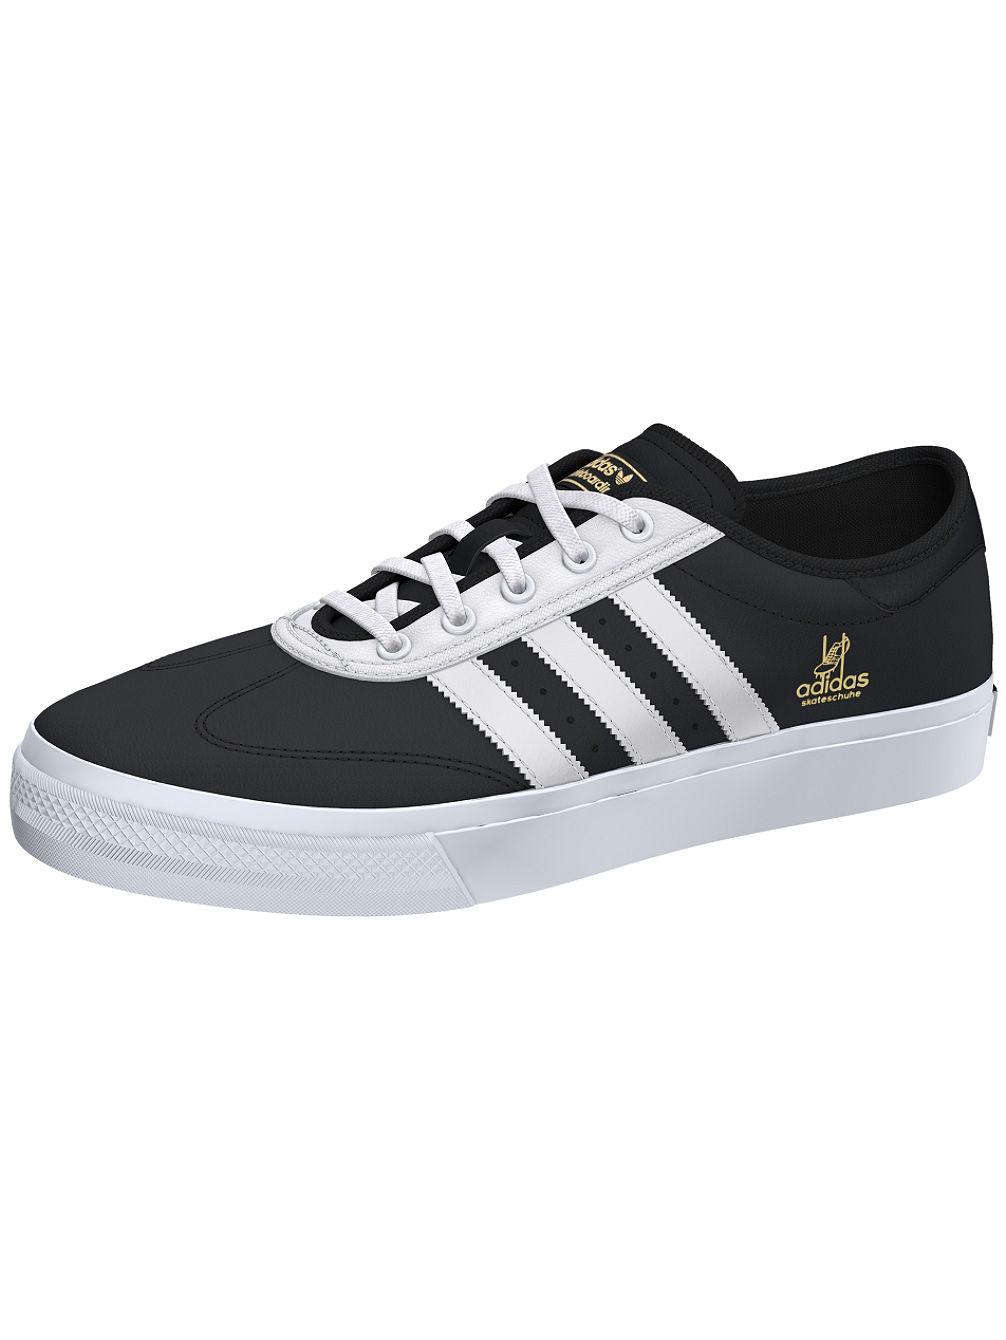 adidas-skateboarding-adi-ease-universal-adv-skate-shoes